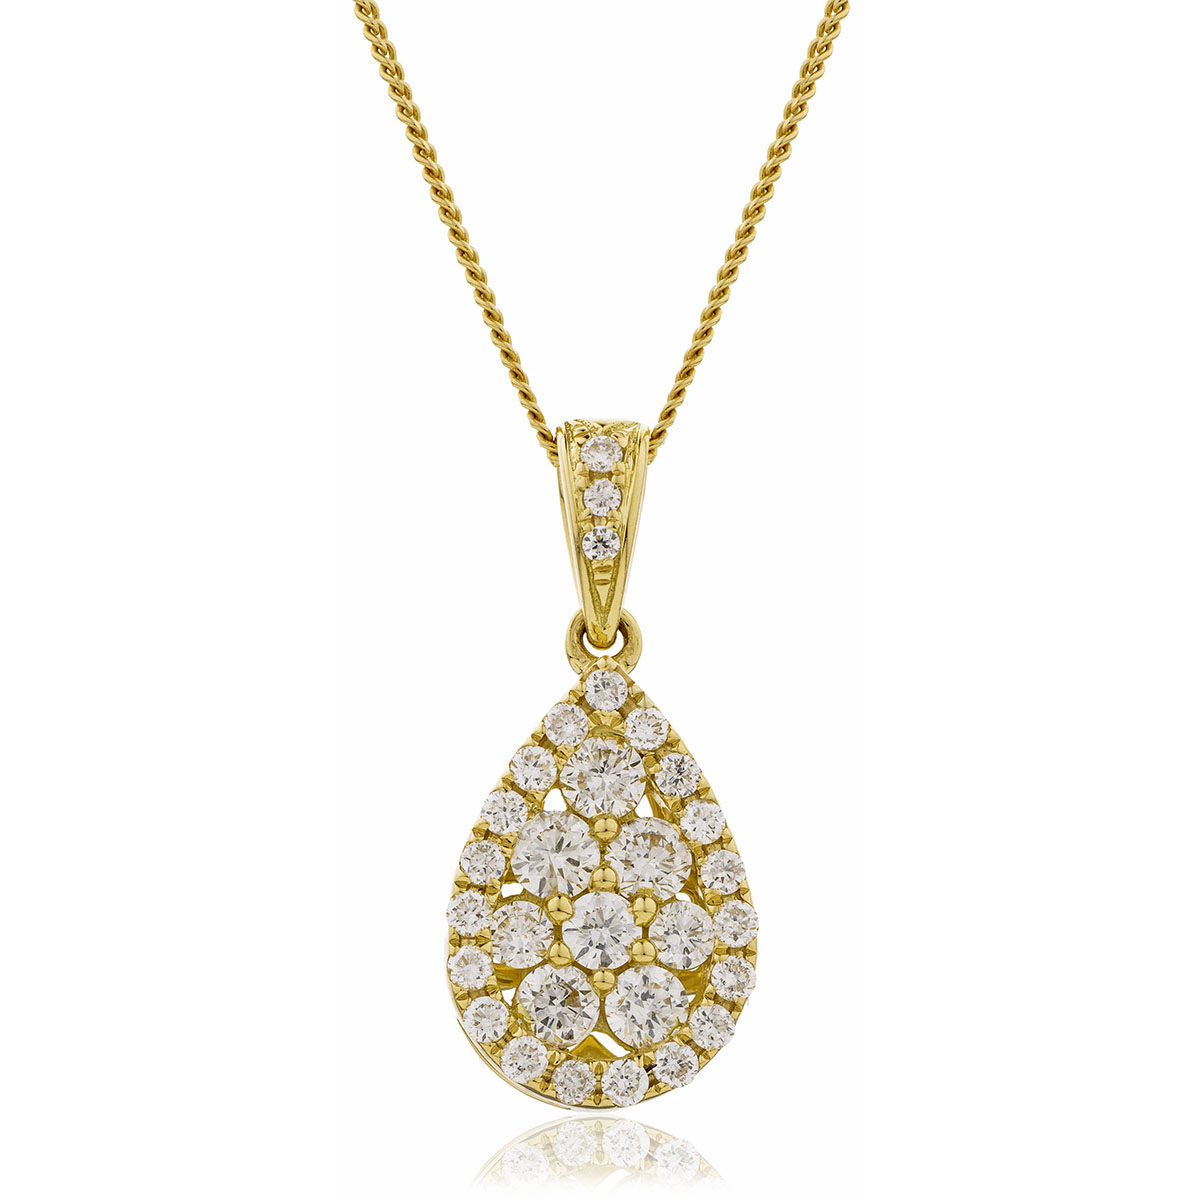 Pear Shaped Medium Pave Diamond Pendant